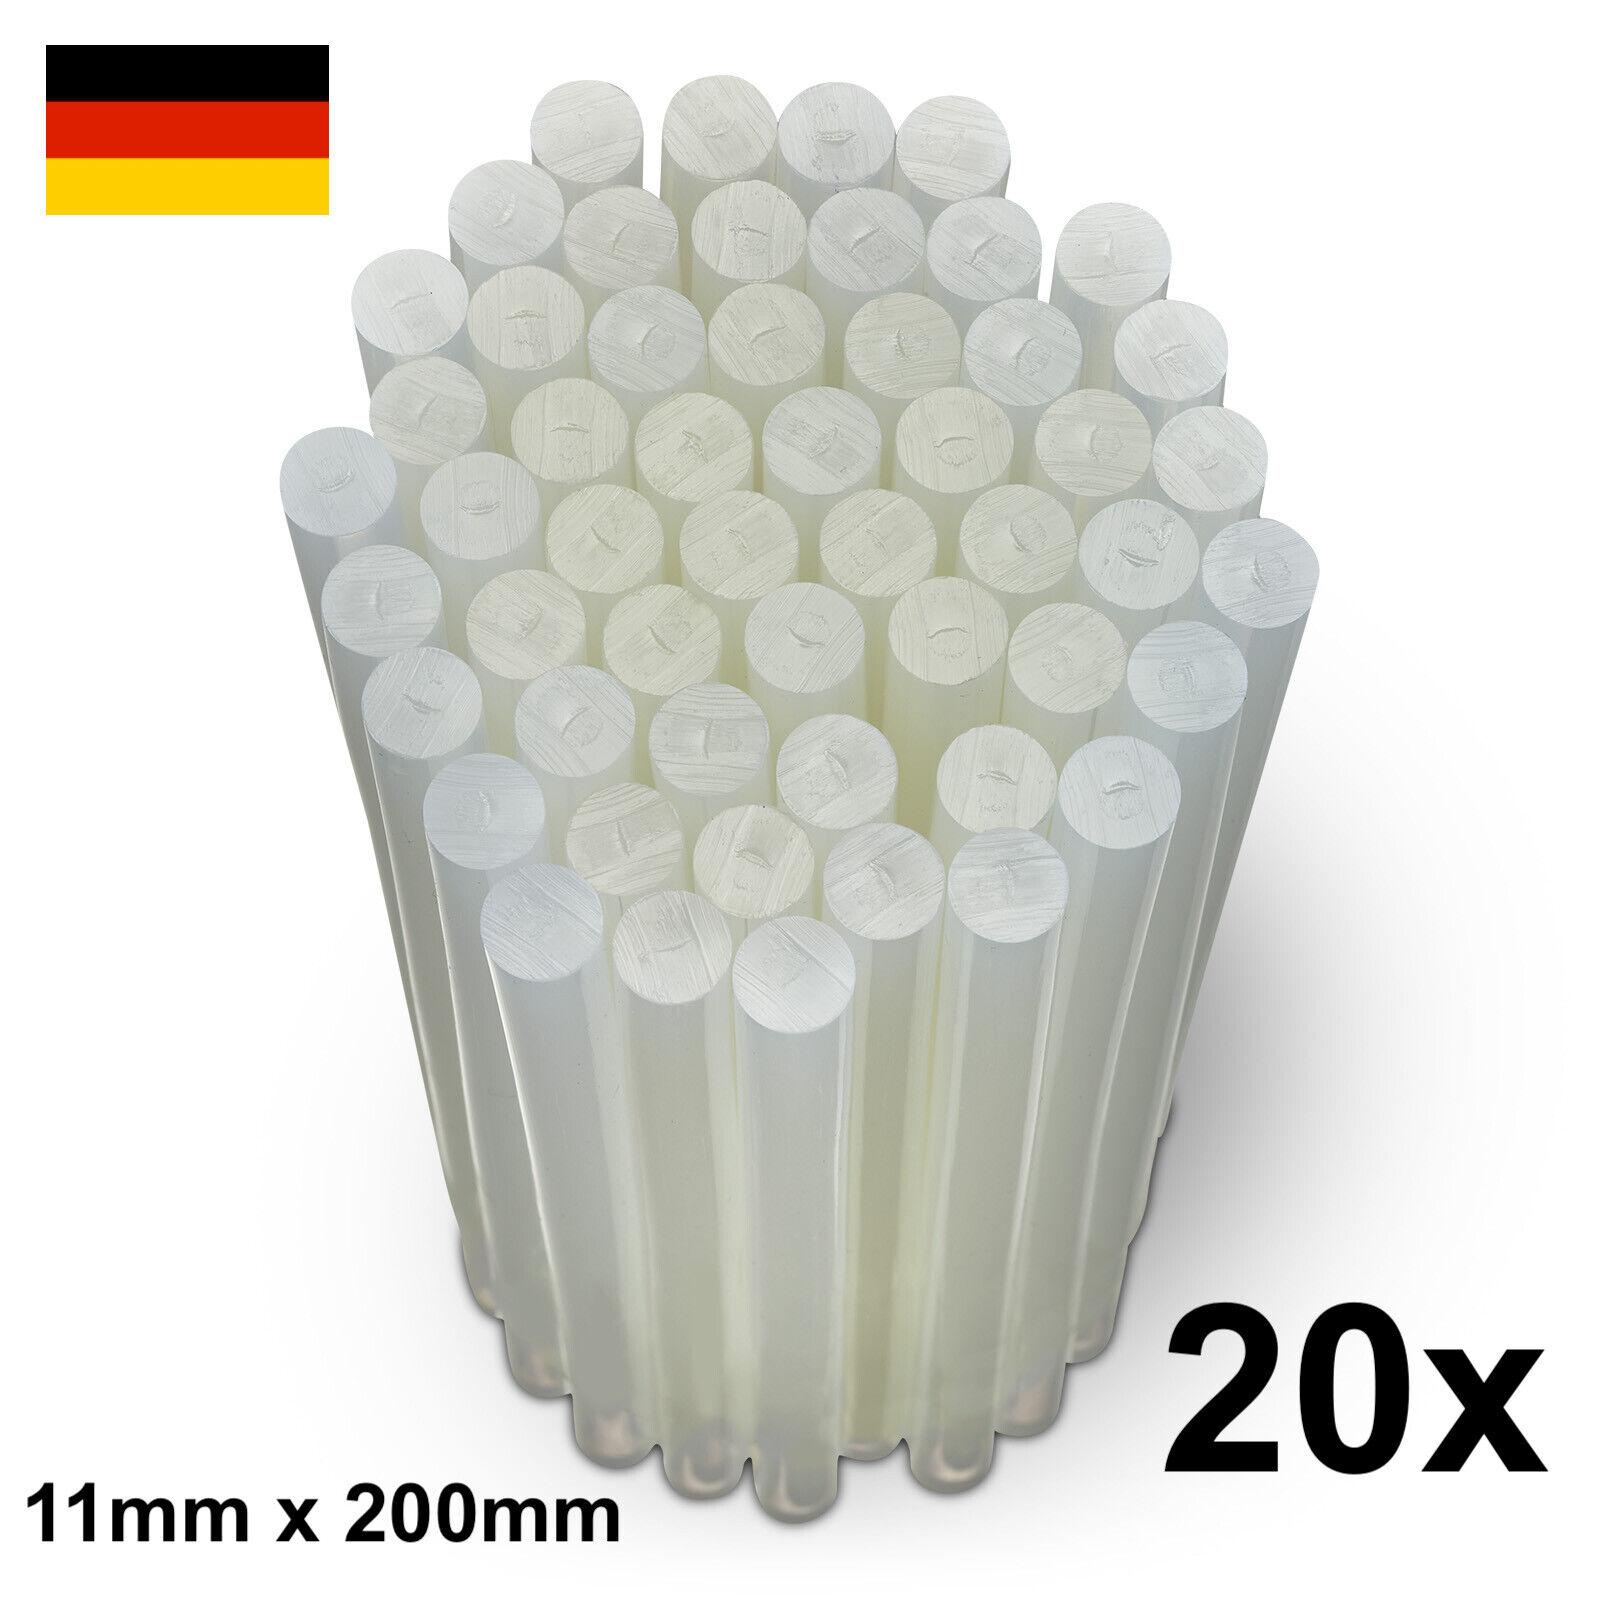 Klebesticks, Heißkleber, Klebepatronen, Heißklebestifte, 11 mm x 200 mm